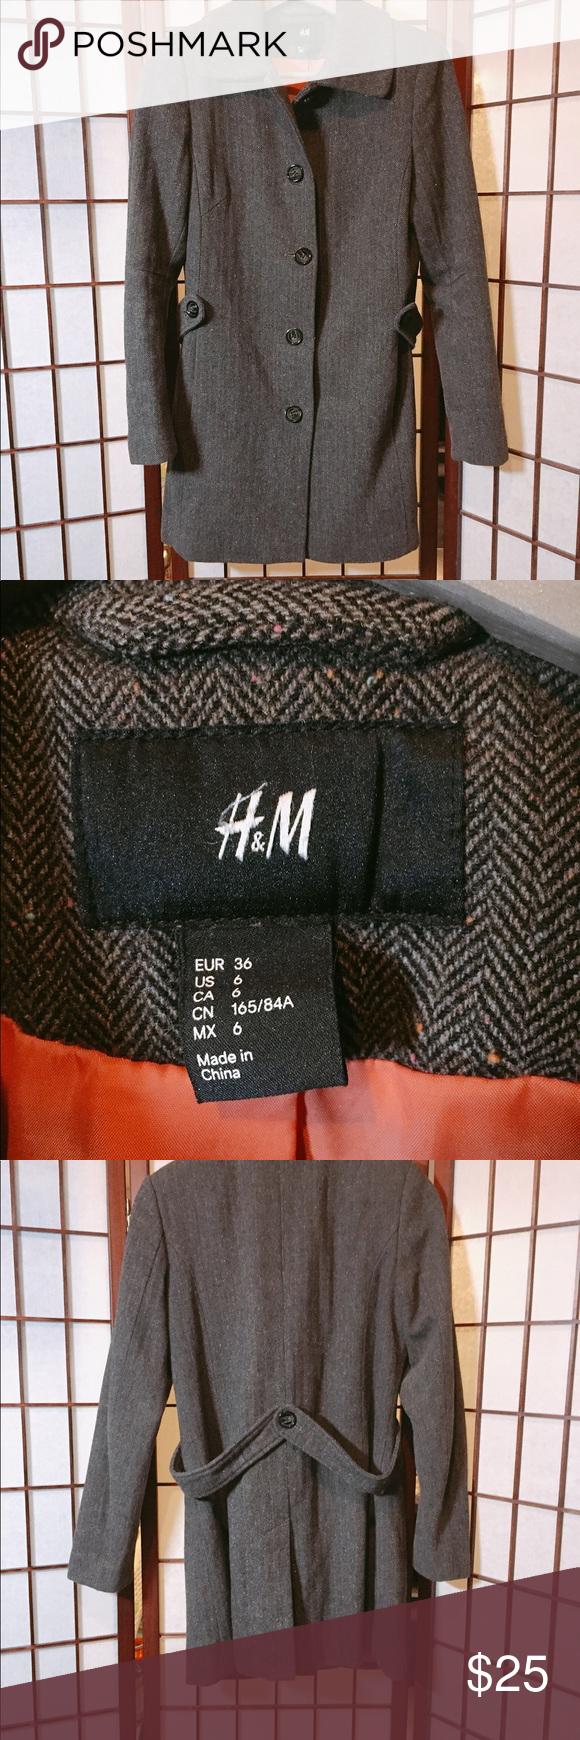 H&M's coat brown color